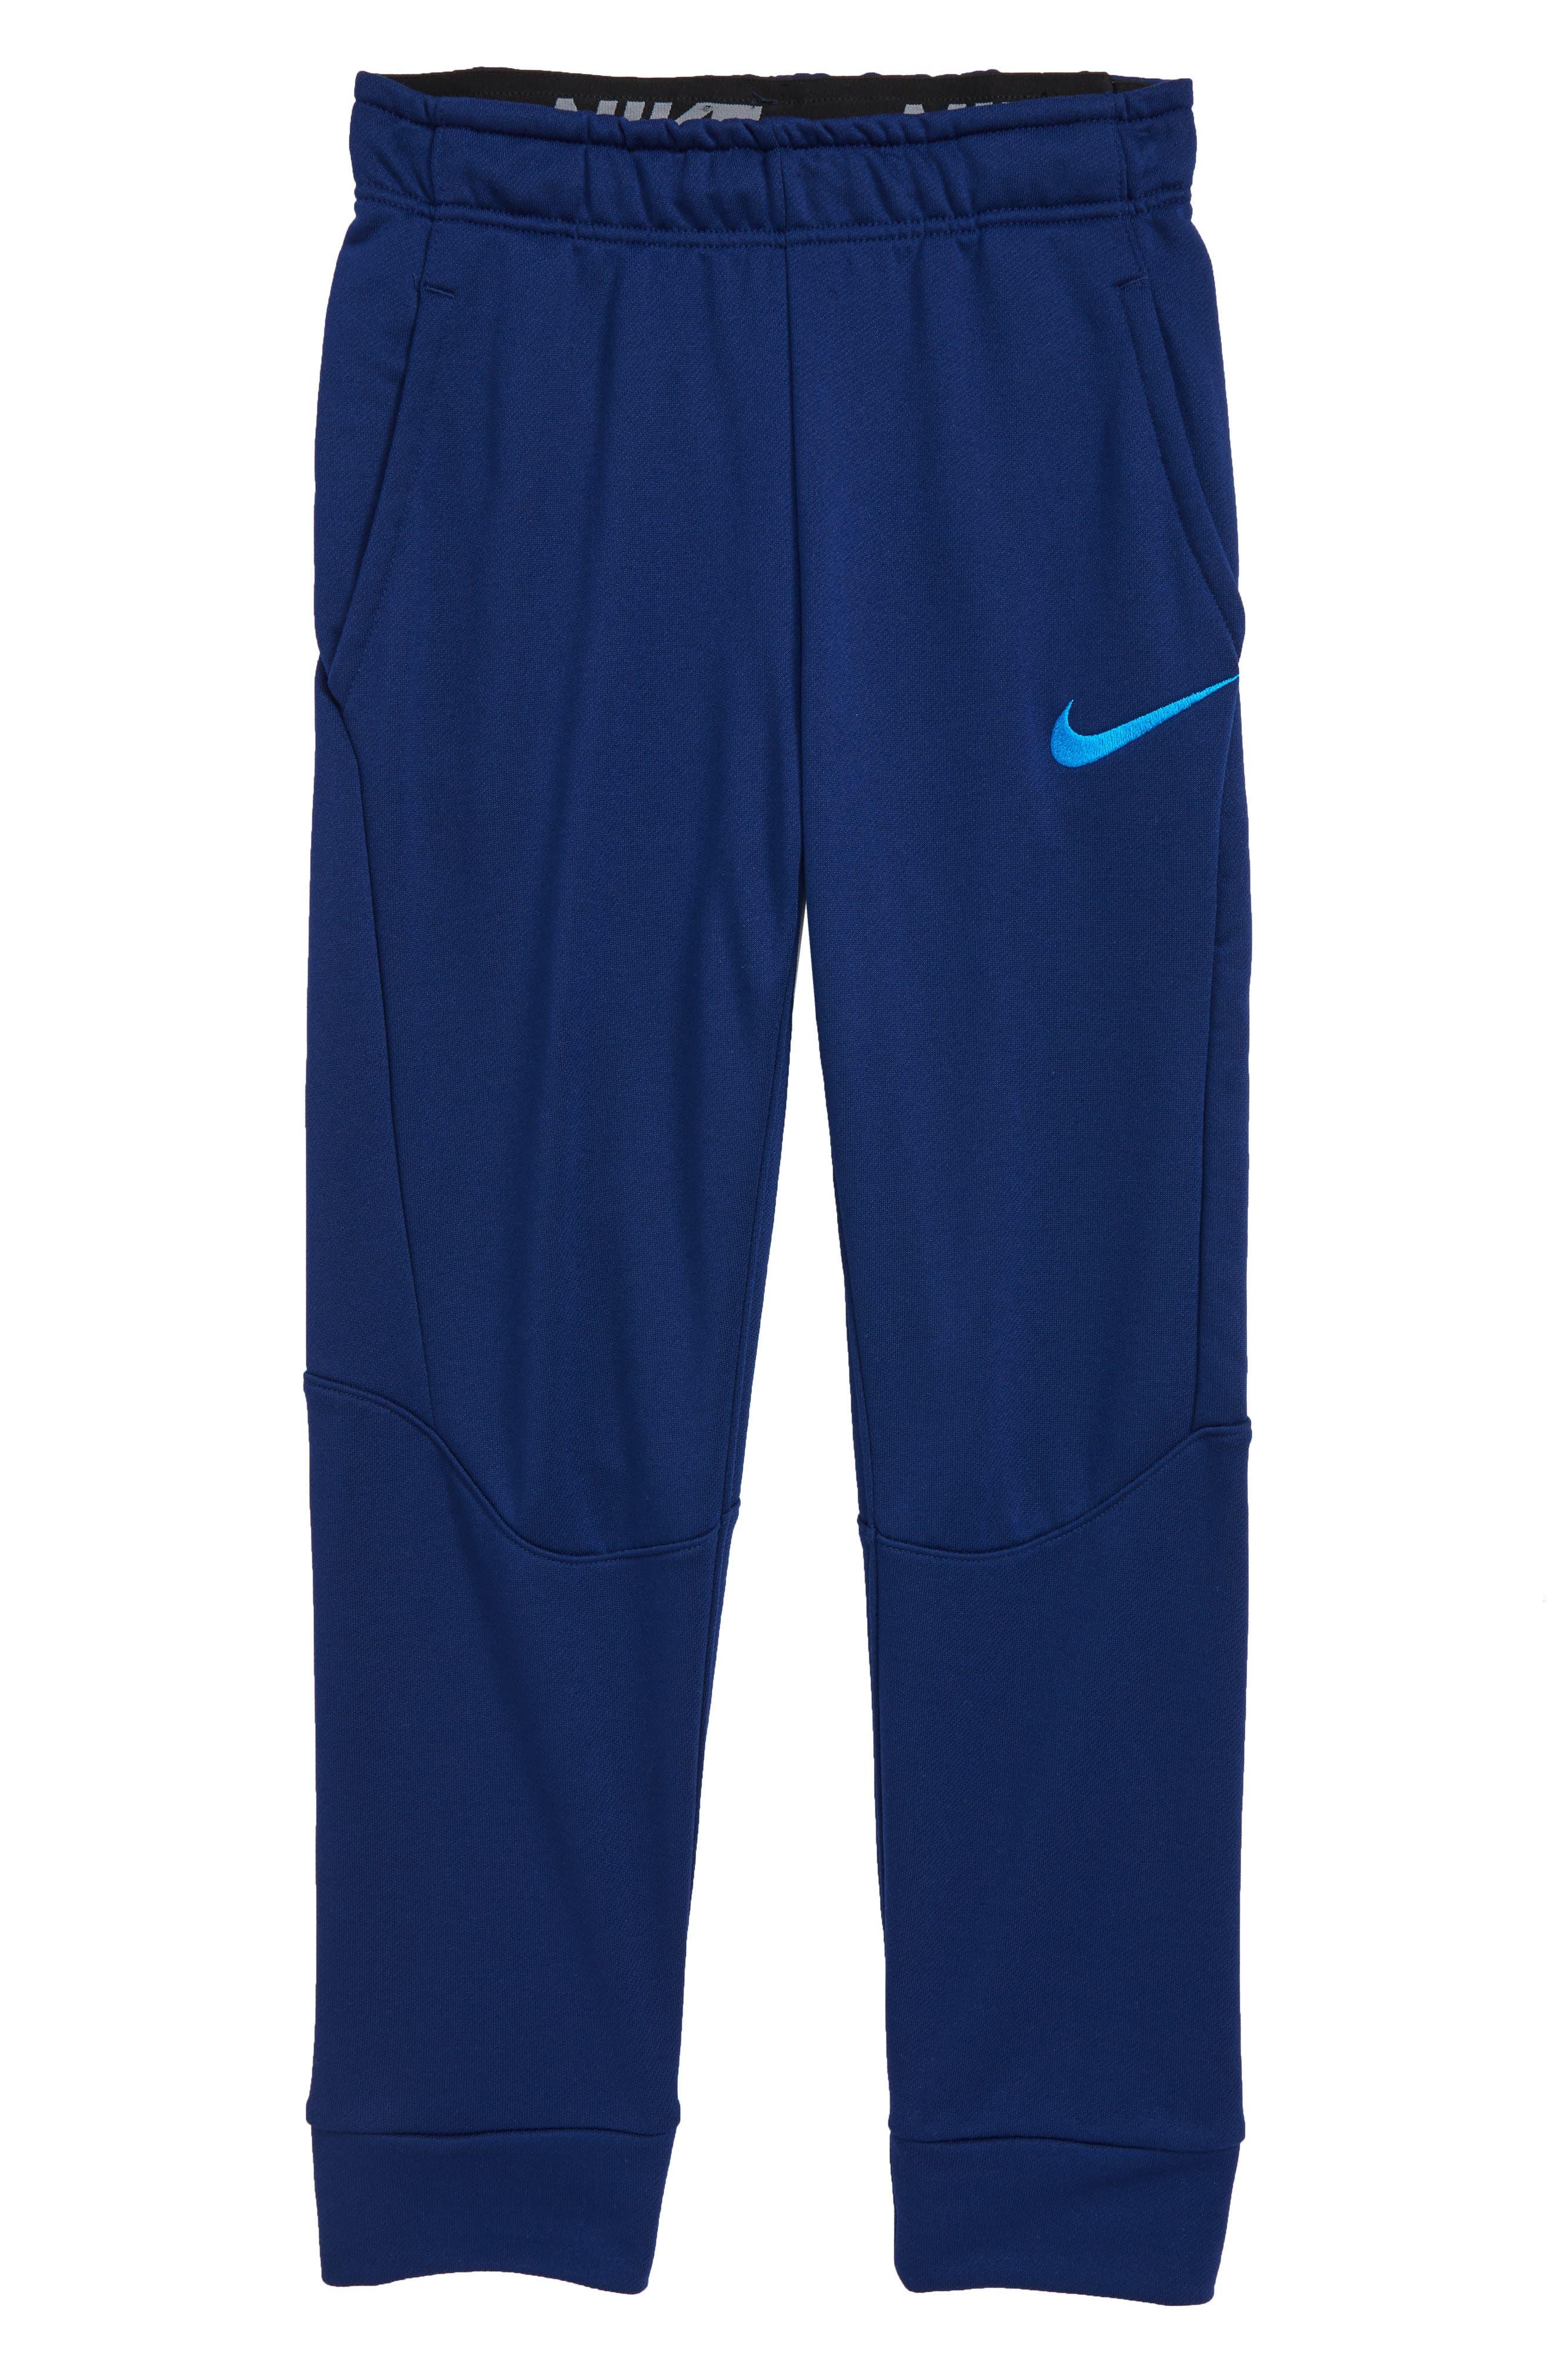 Dry Fleece Training Pants,                         Main,                         color, Blue Void/ Blue Hero